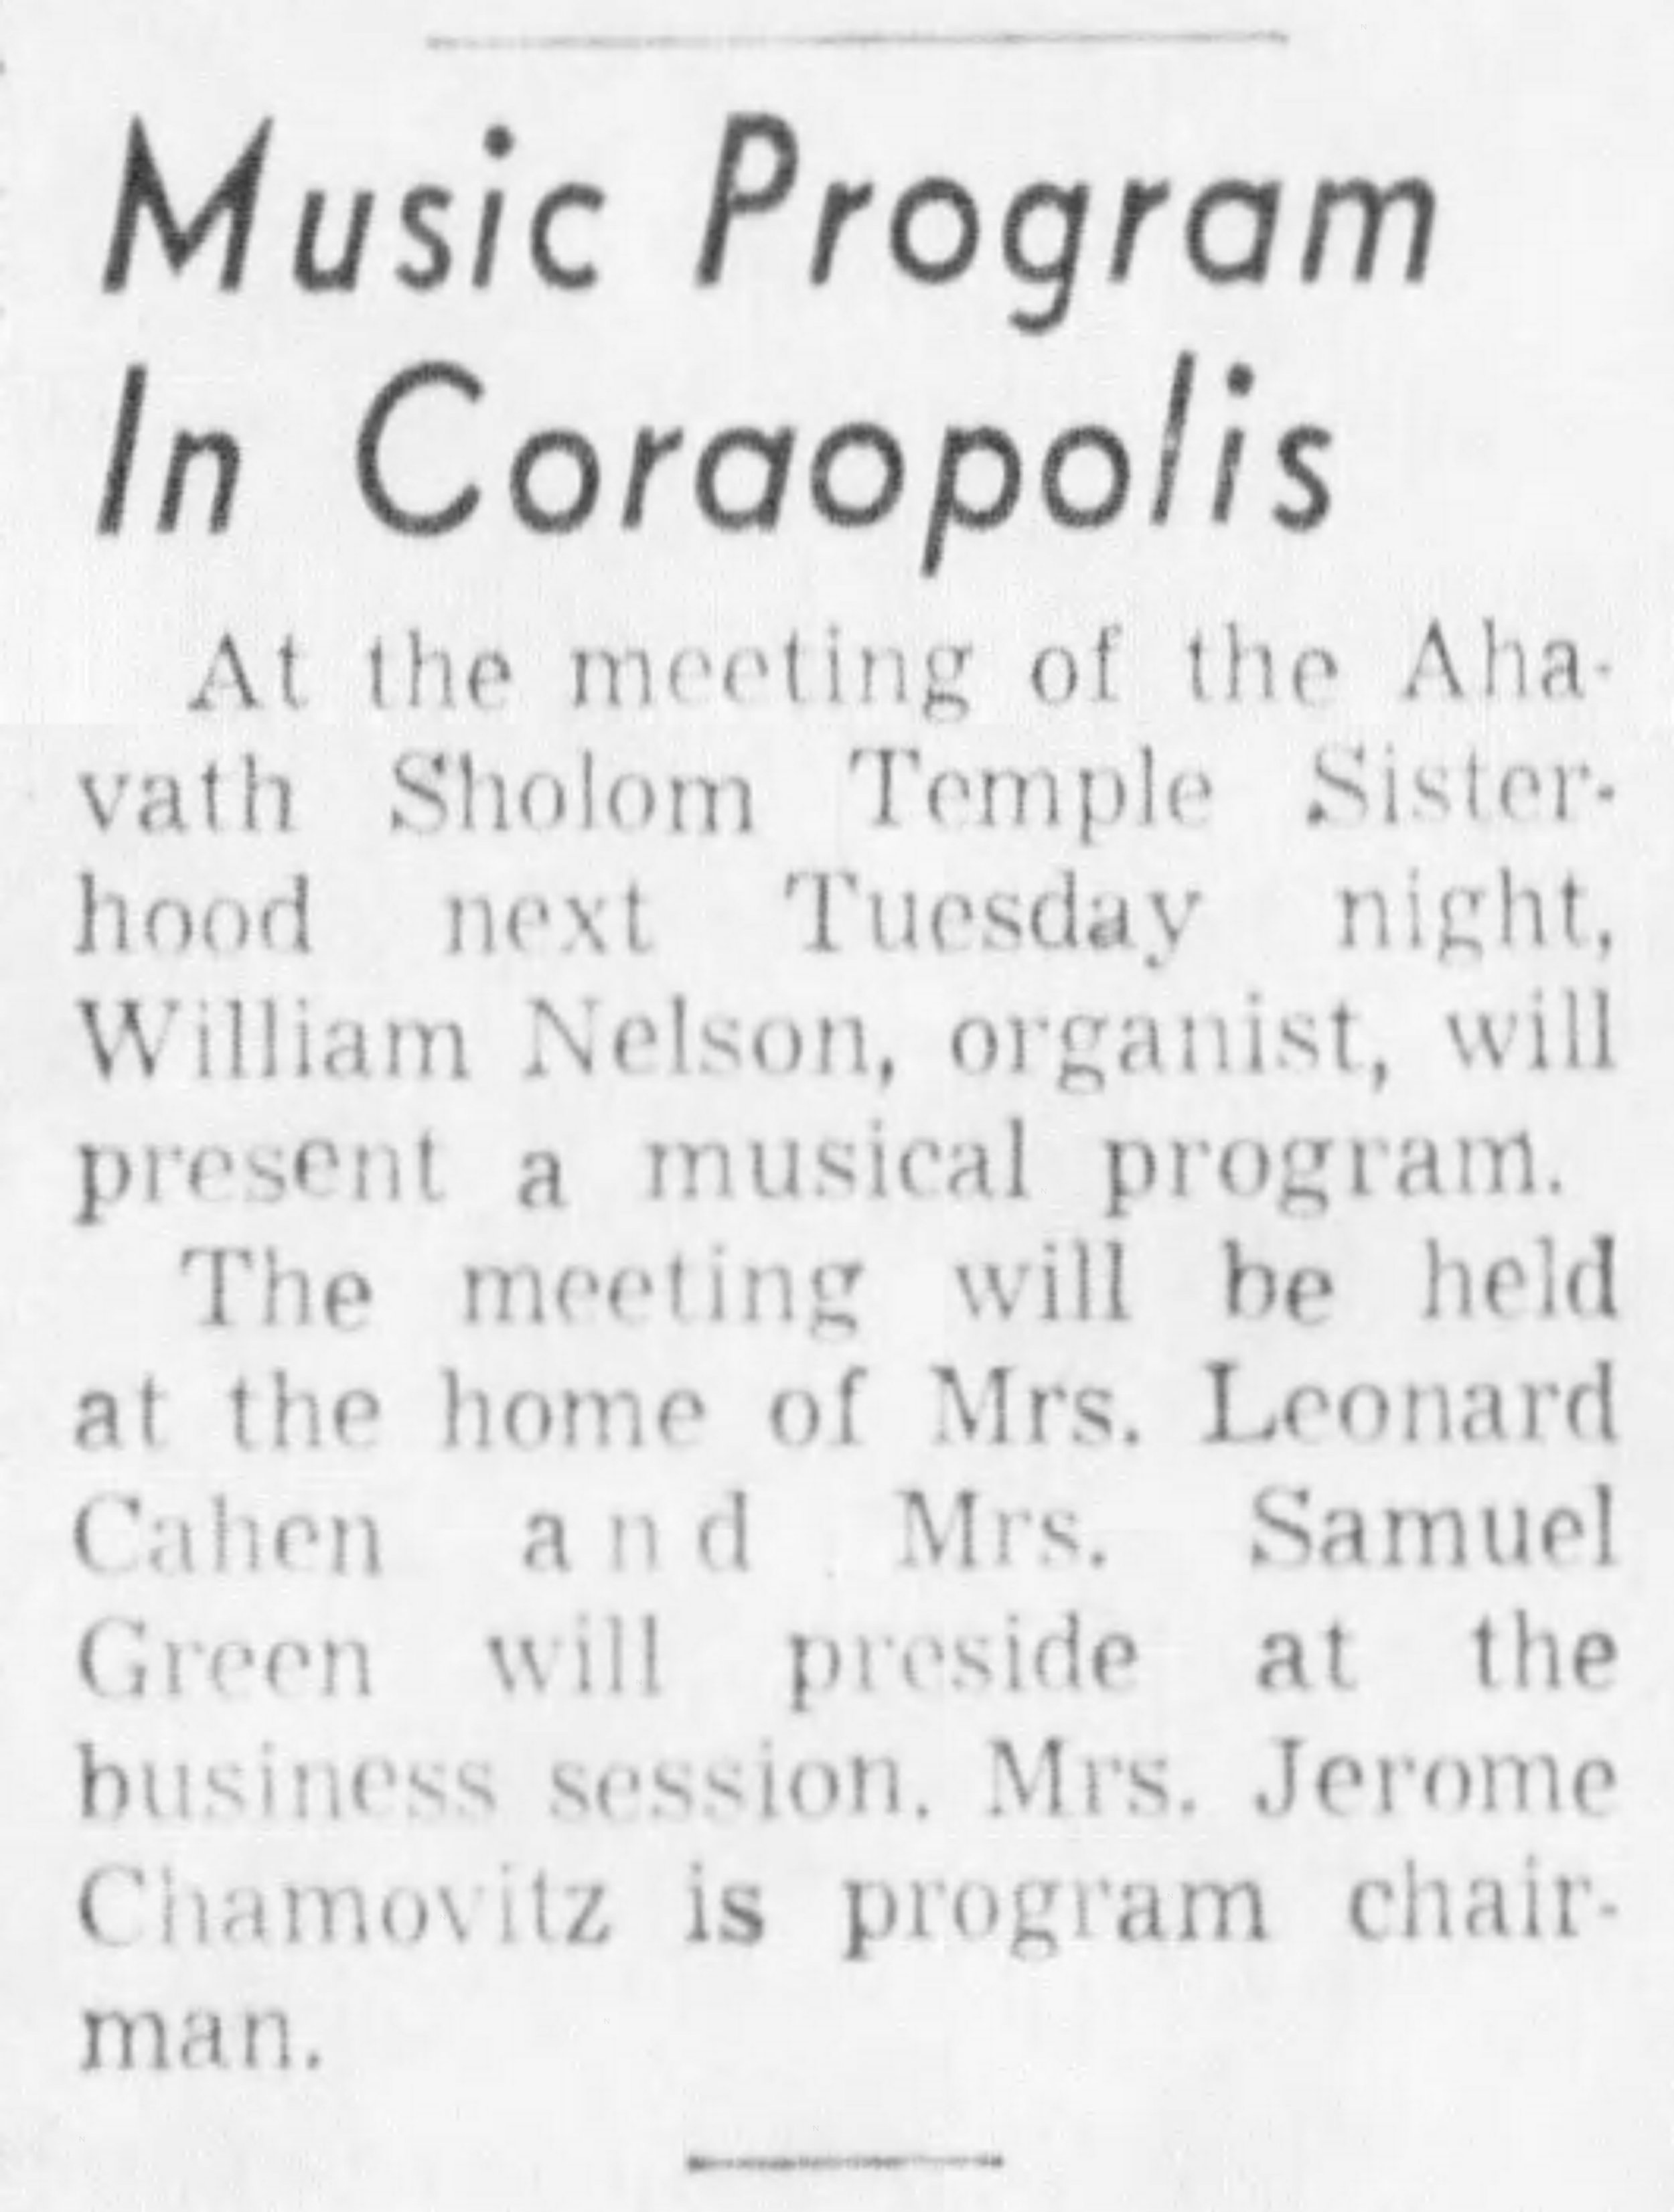 1962-02-07 Pittsburgh Post-Gazette (v35, n179, p10)